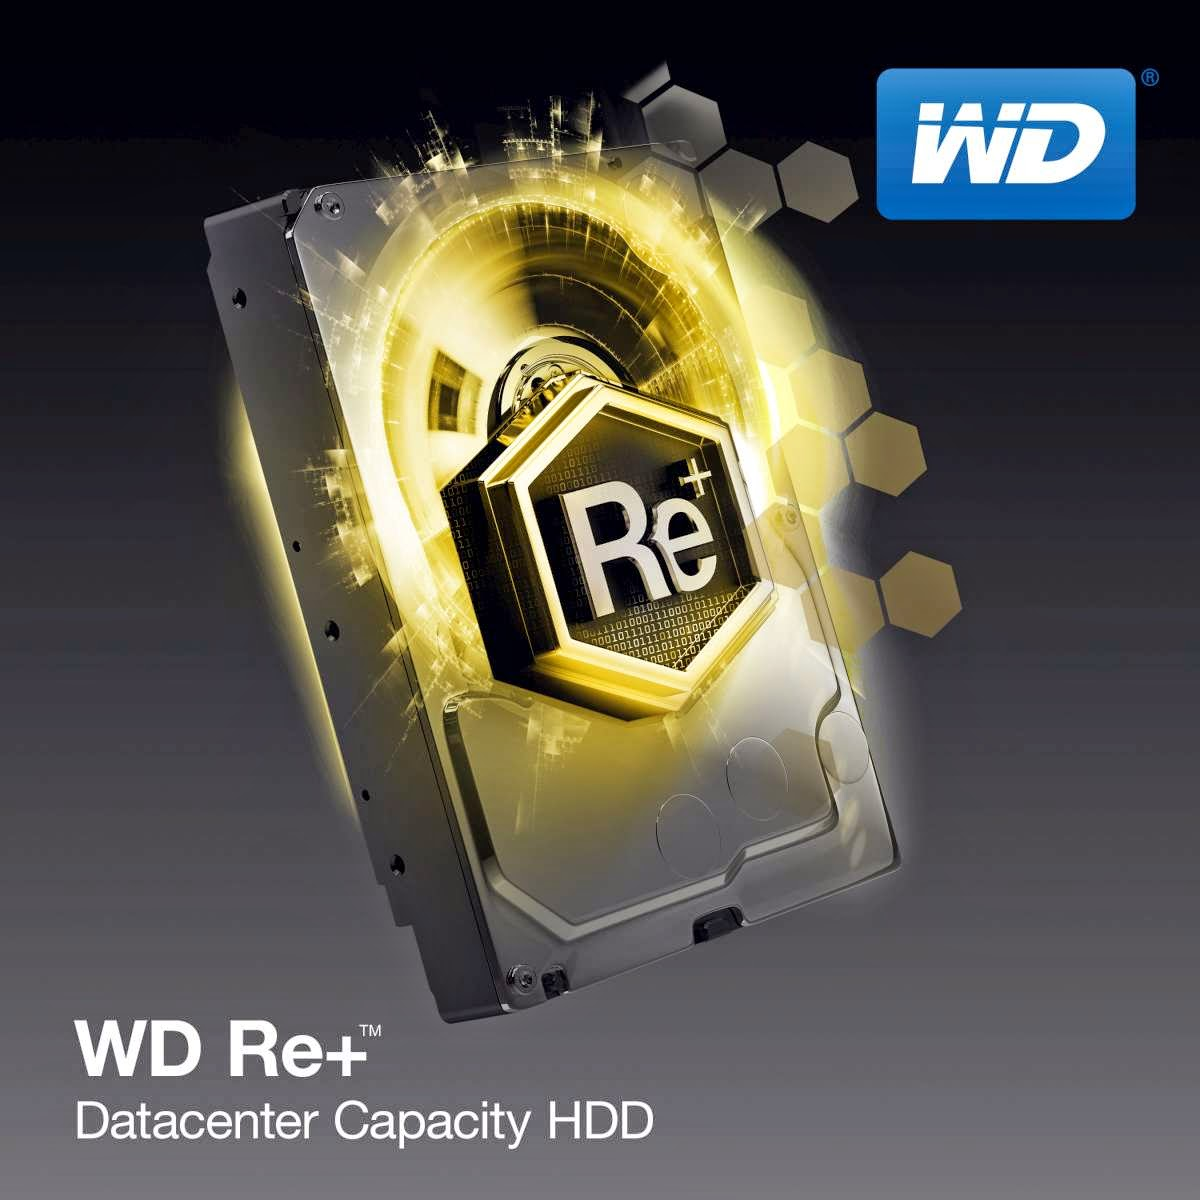 WD Re+ Hard Drive